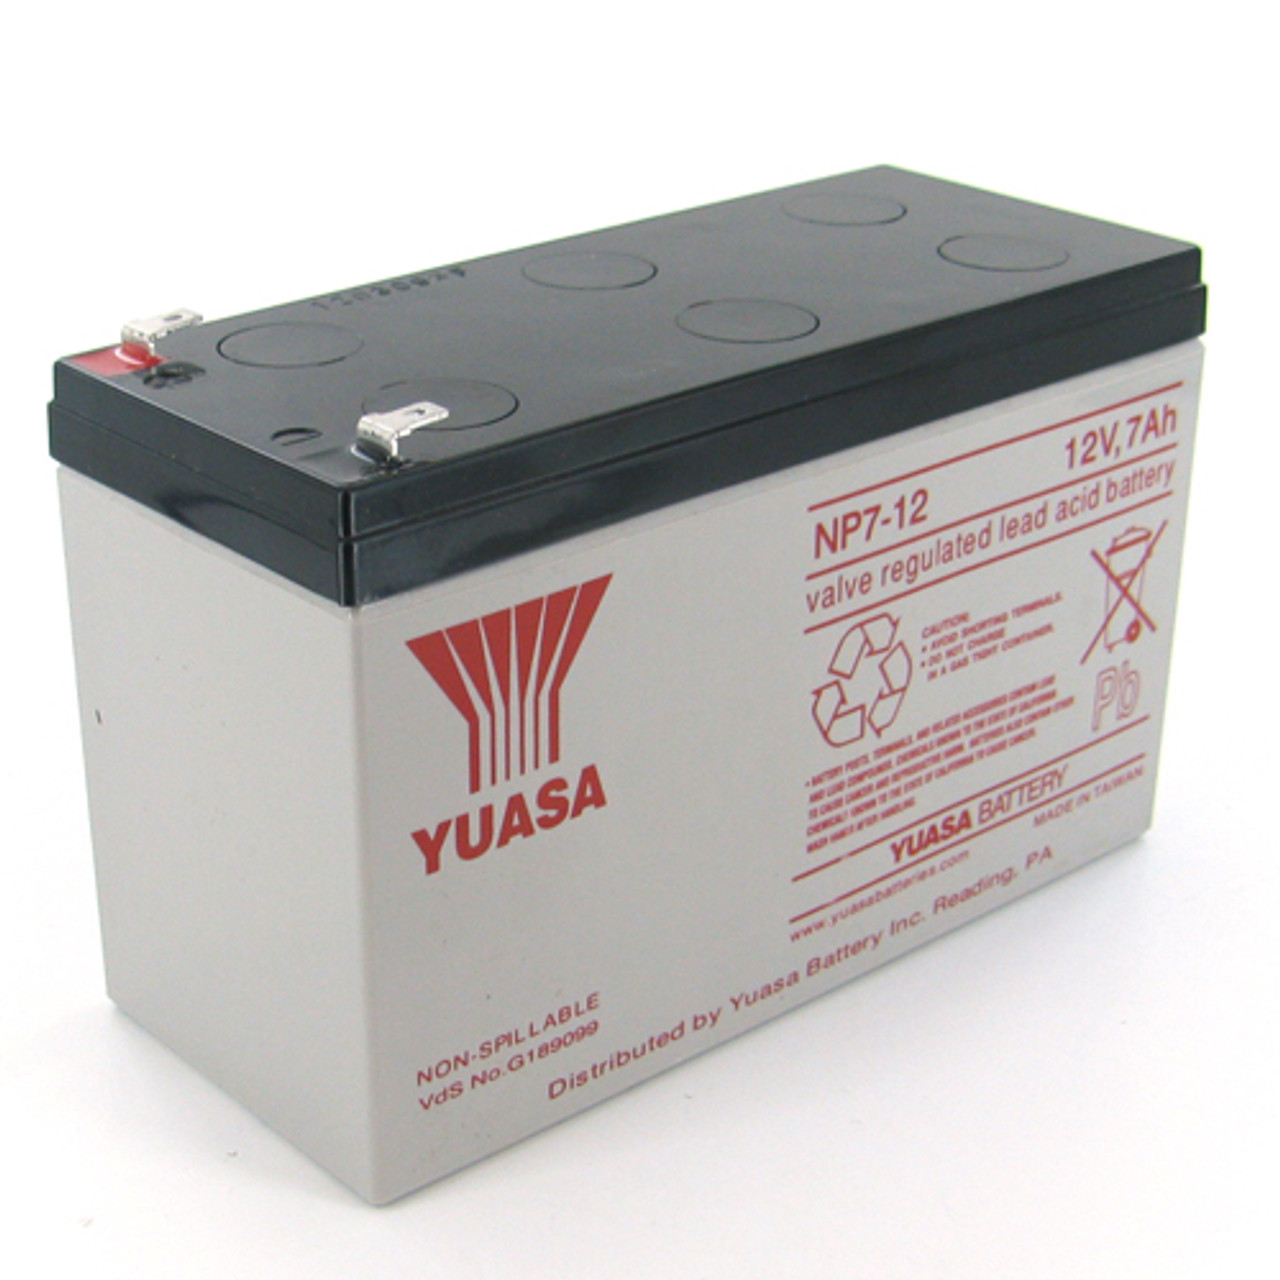 Yuasa NP7-12F2 12V 7Ah Sealed Lead Acid Battery